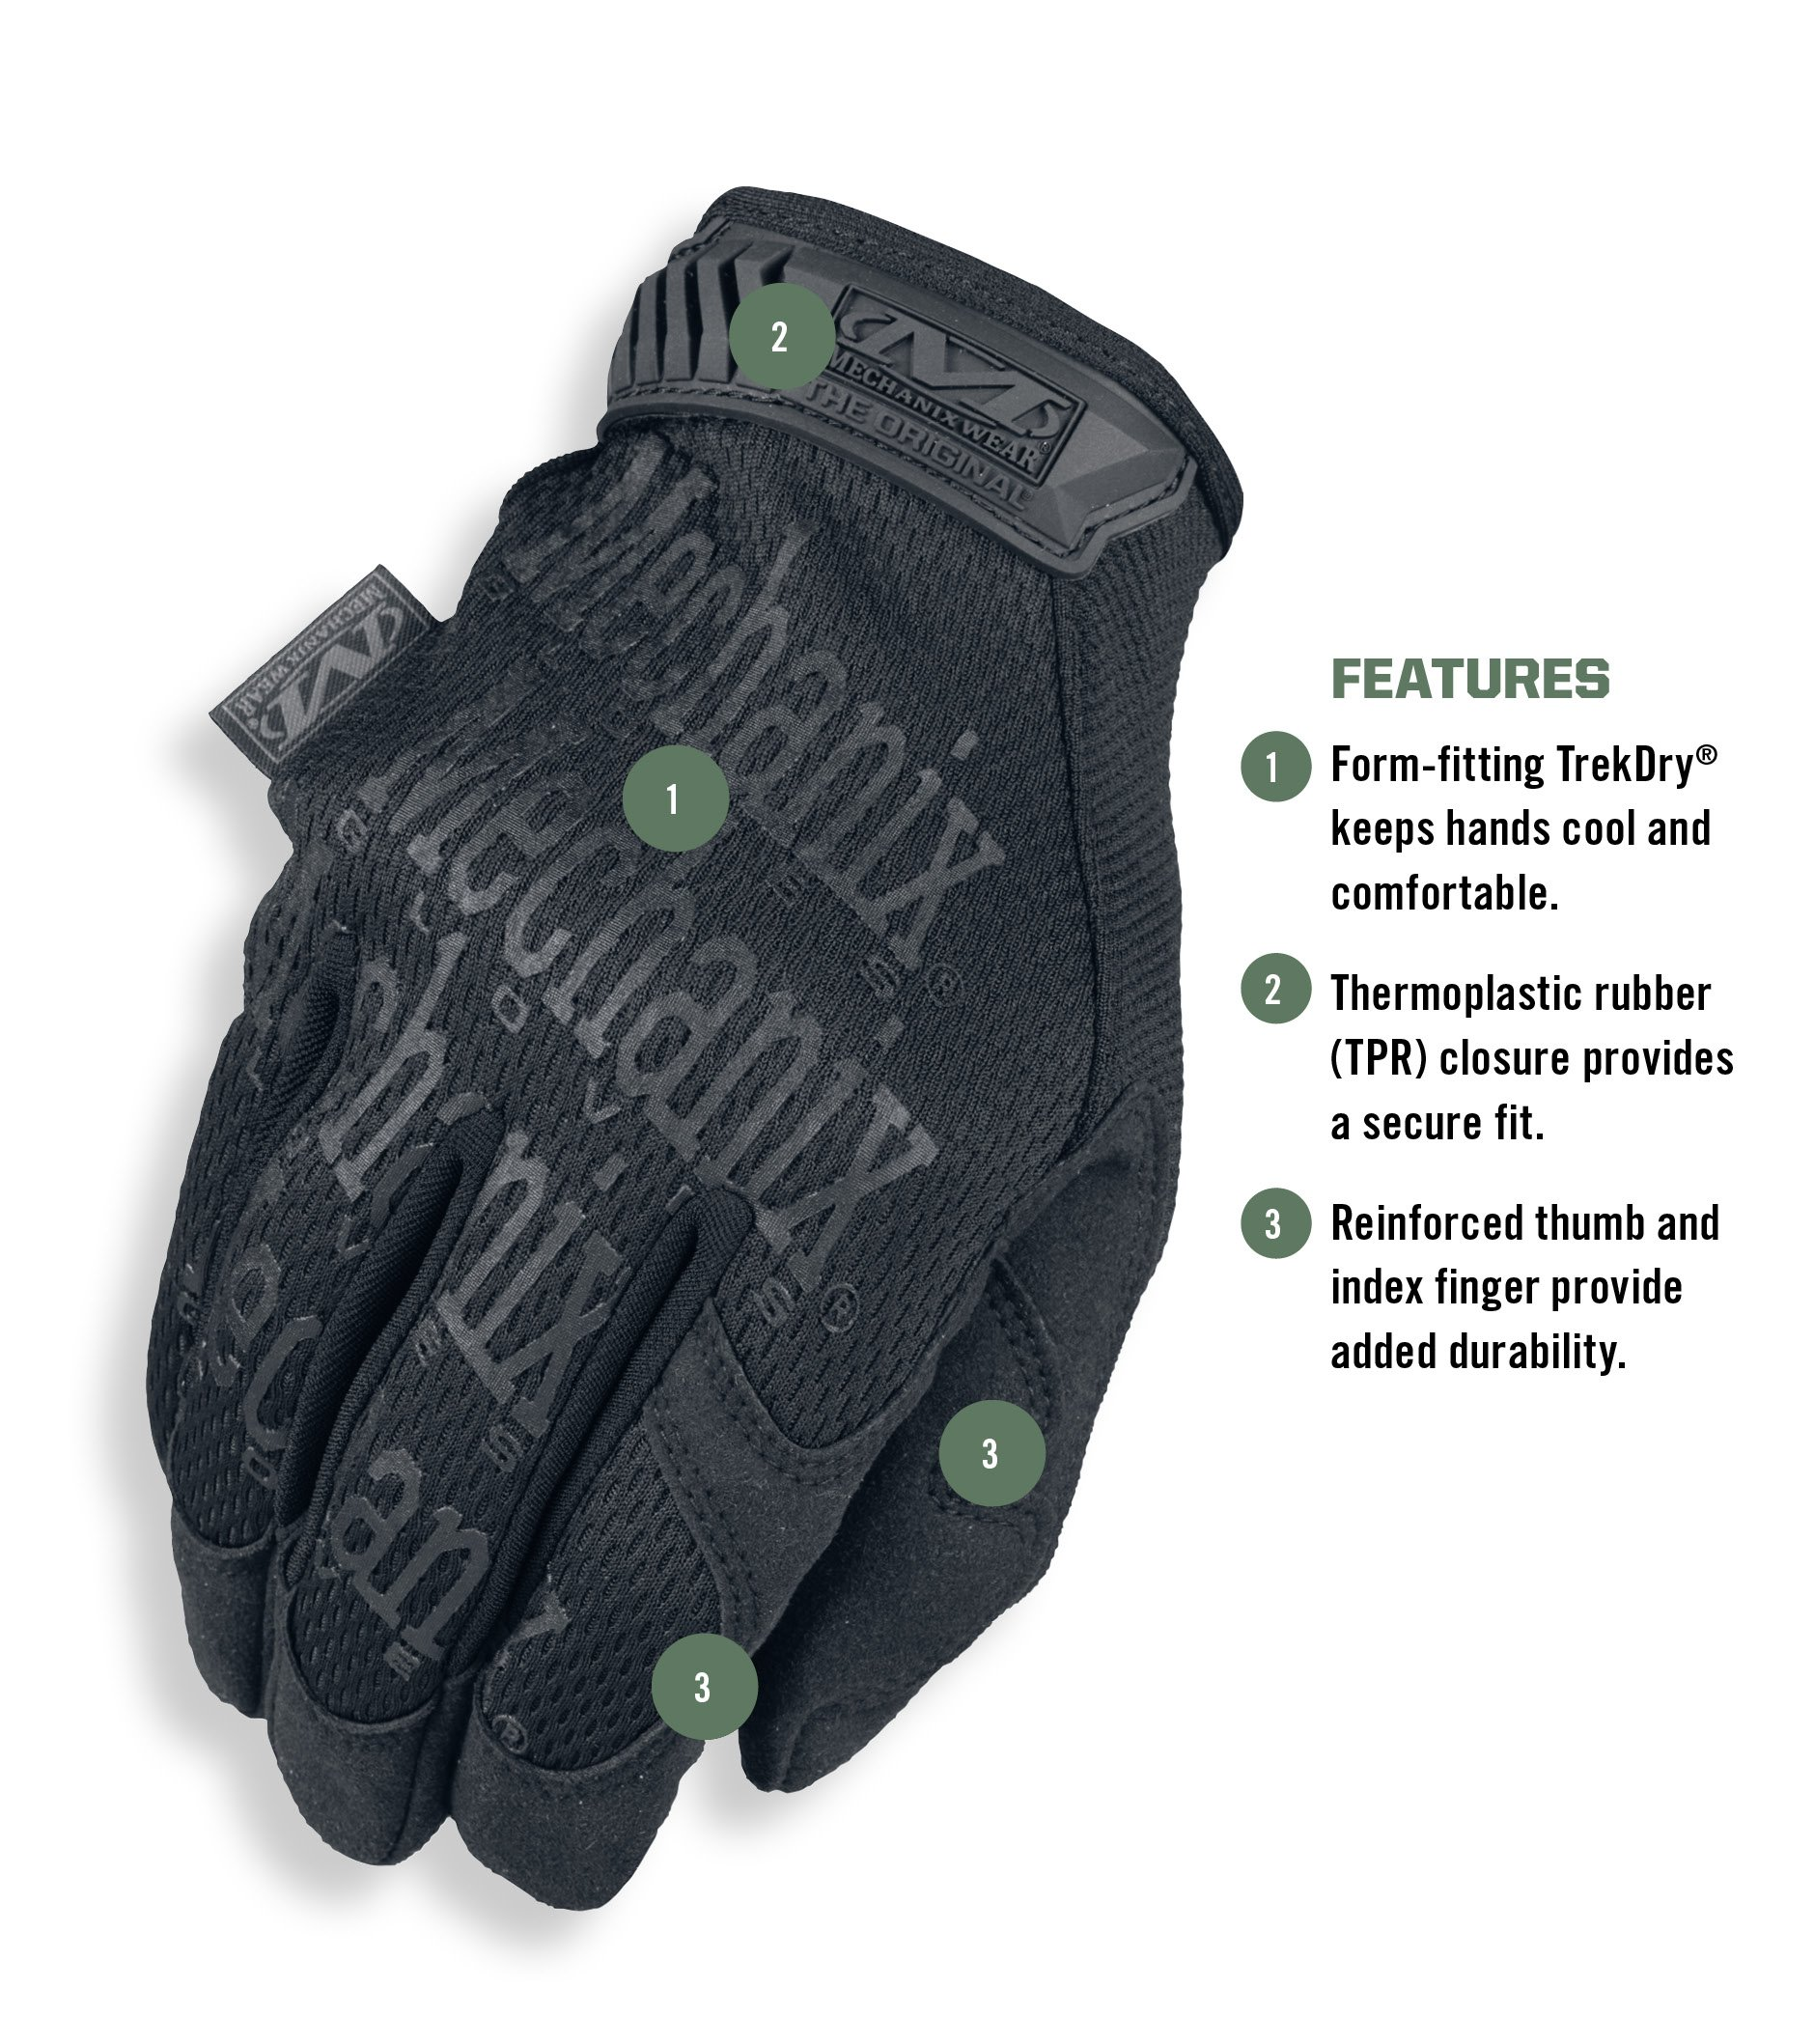 Mechanix Wear - Original Covert Tactical Gloves (Large, Black) by Mechanix Wear (Image #2)